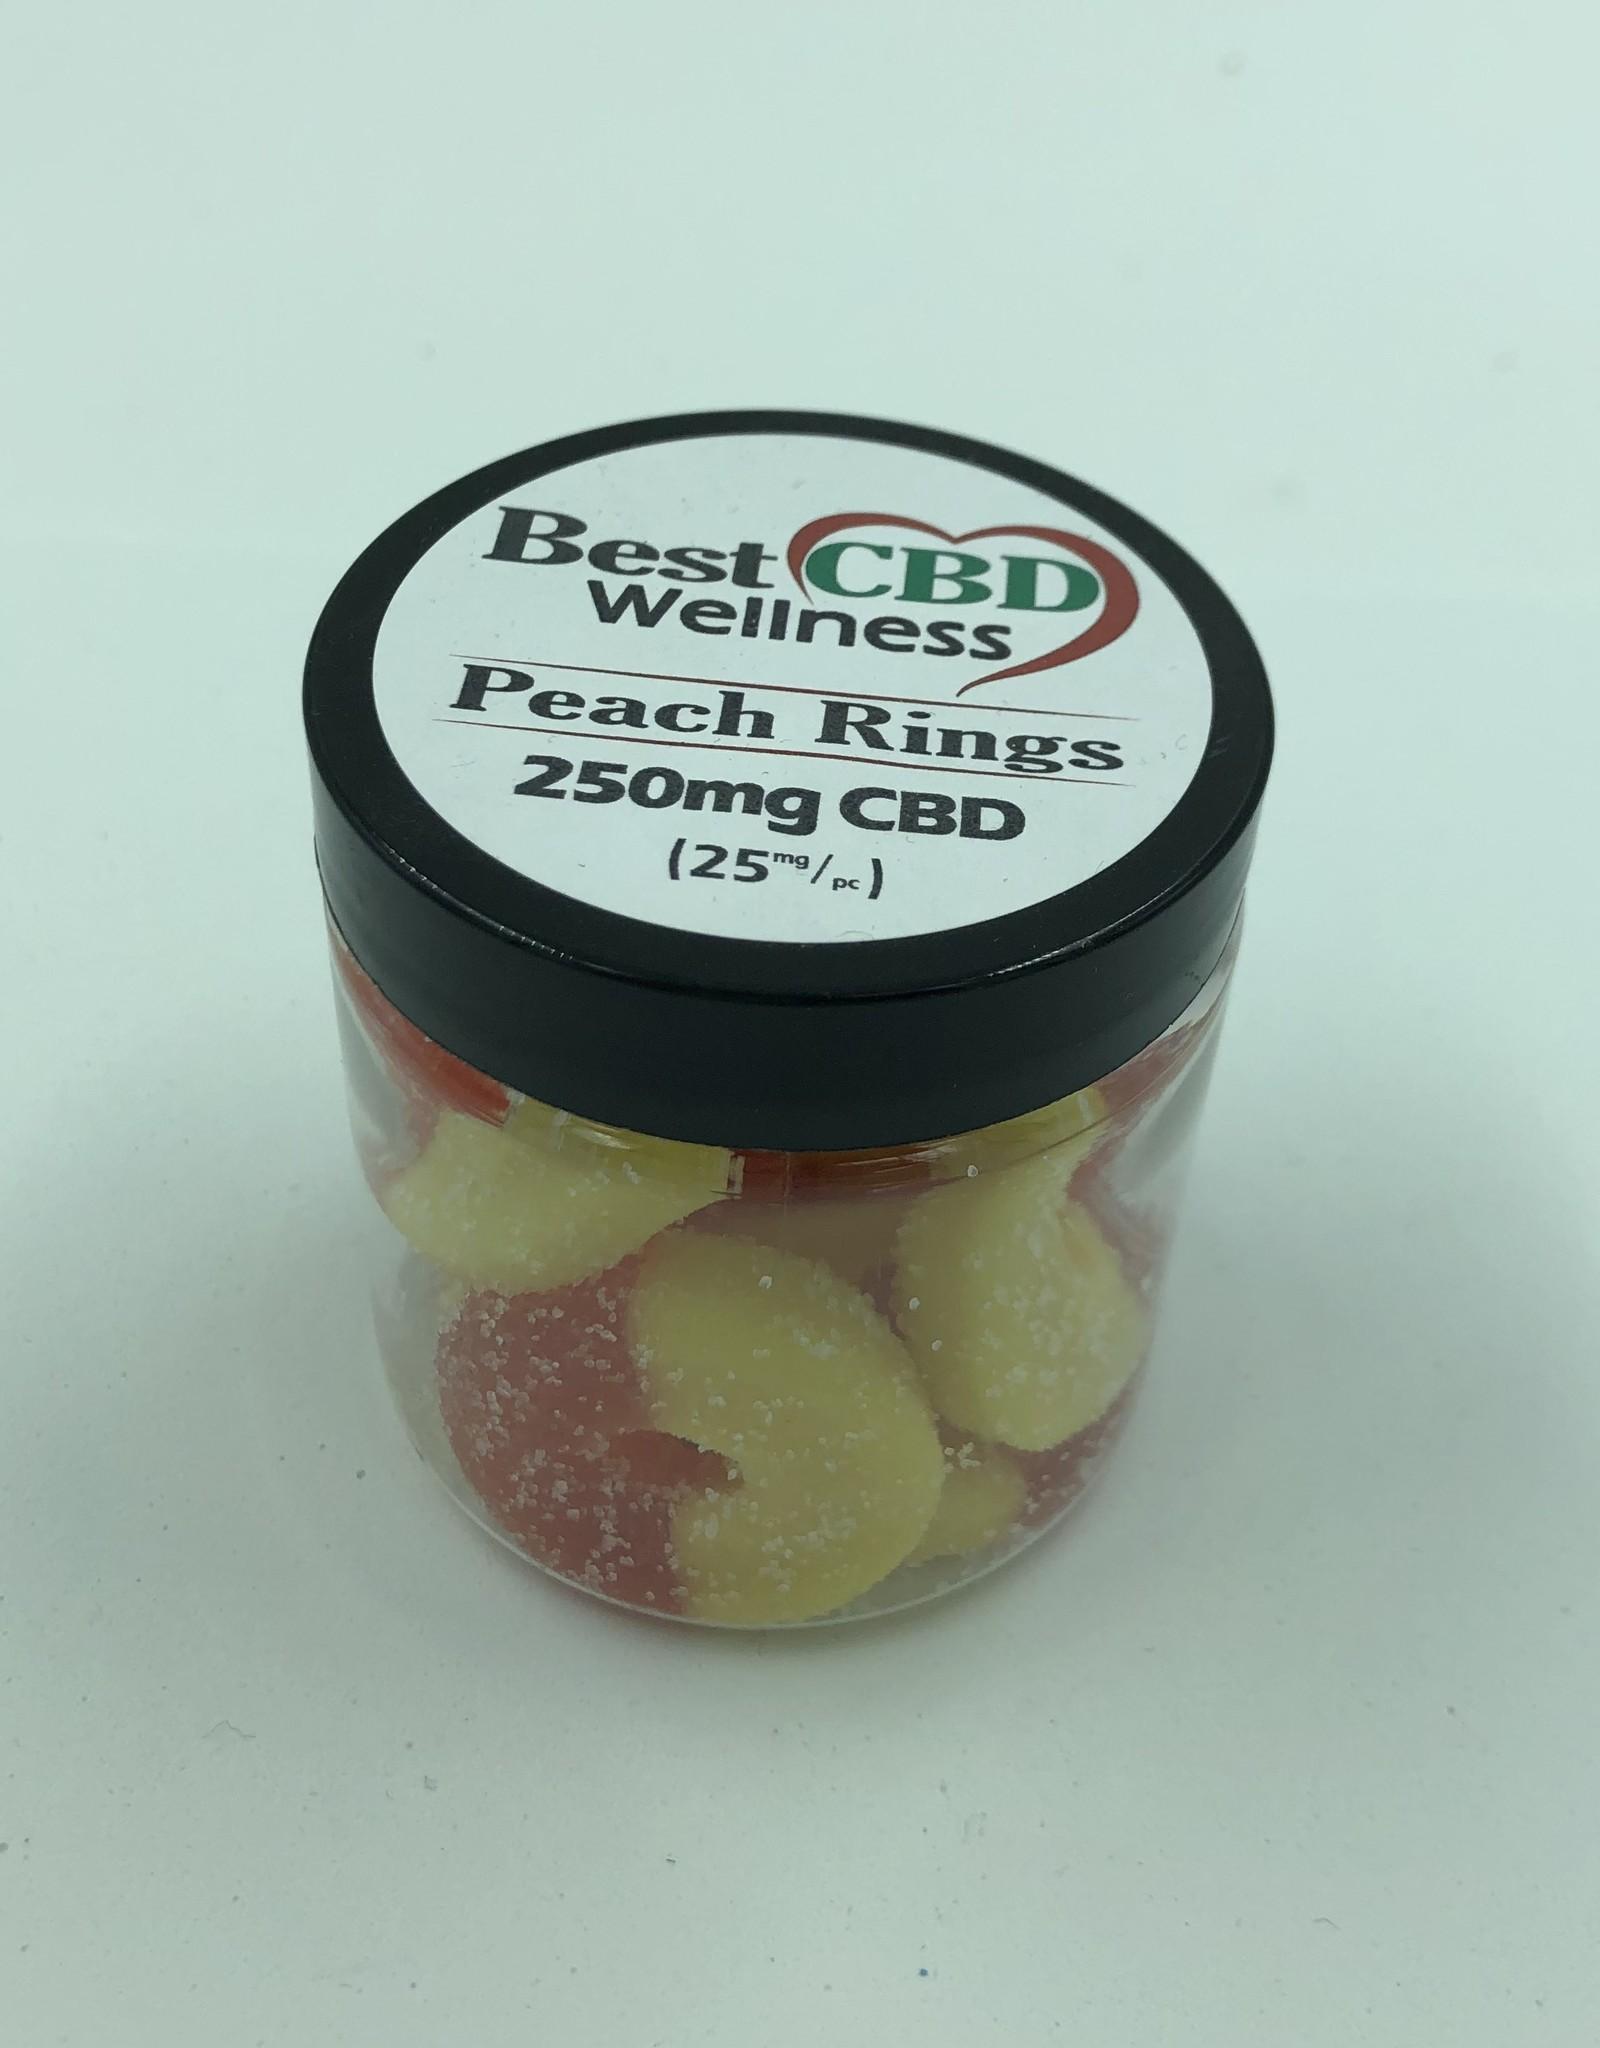 Best CBD Wellness Isolate CBD Peach Rings 250mg  10 pc/25mg ea